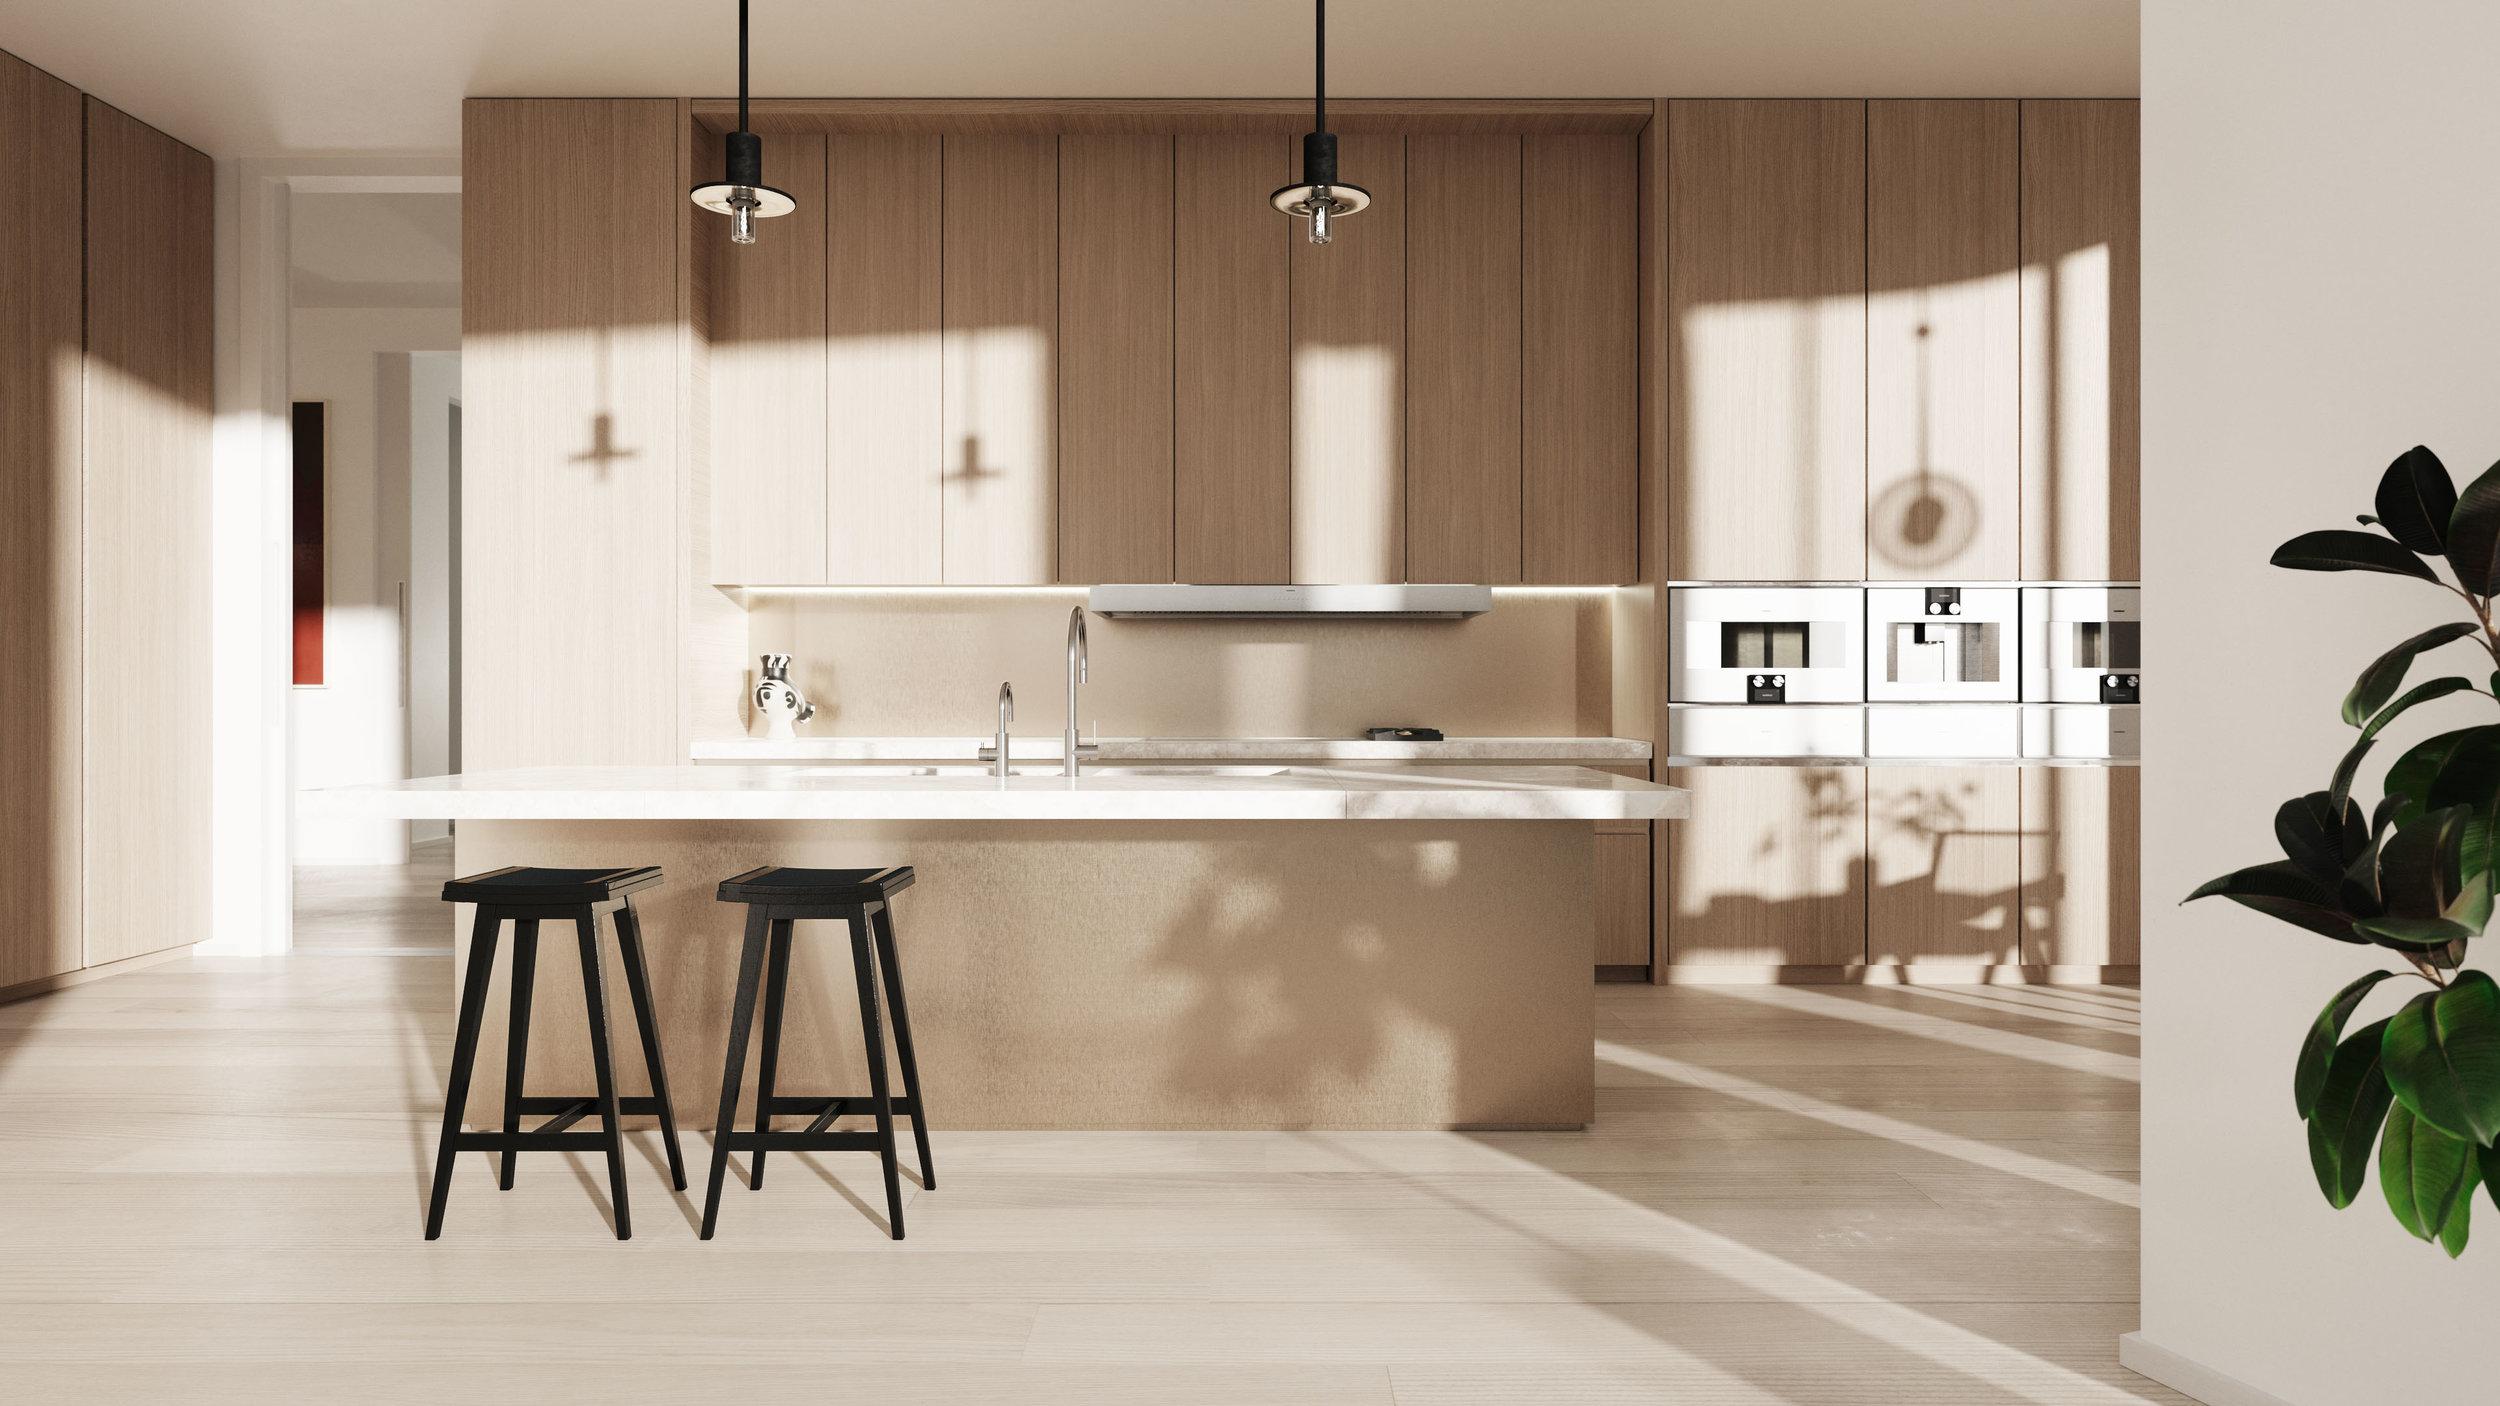 RenzoPiano_Kitchen_StraightOn_190218_Luke_001.jpg